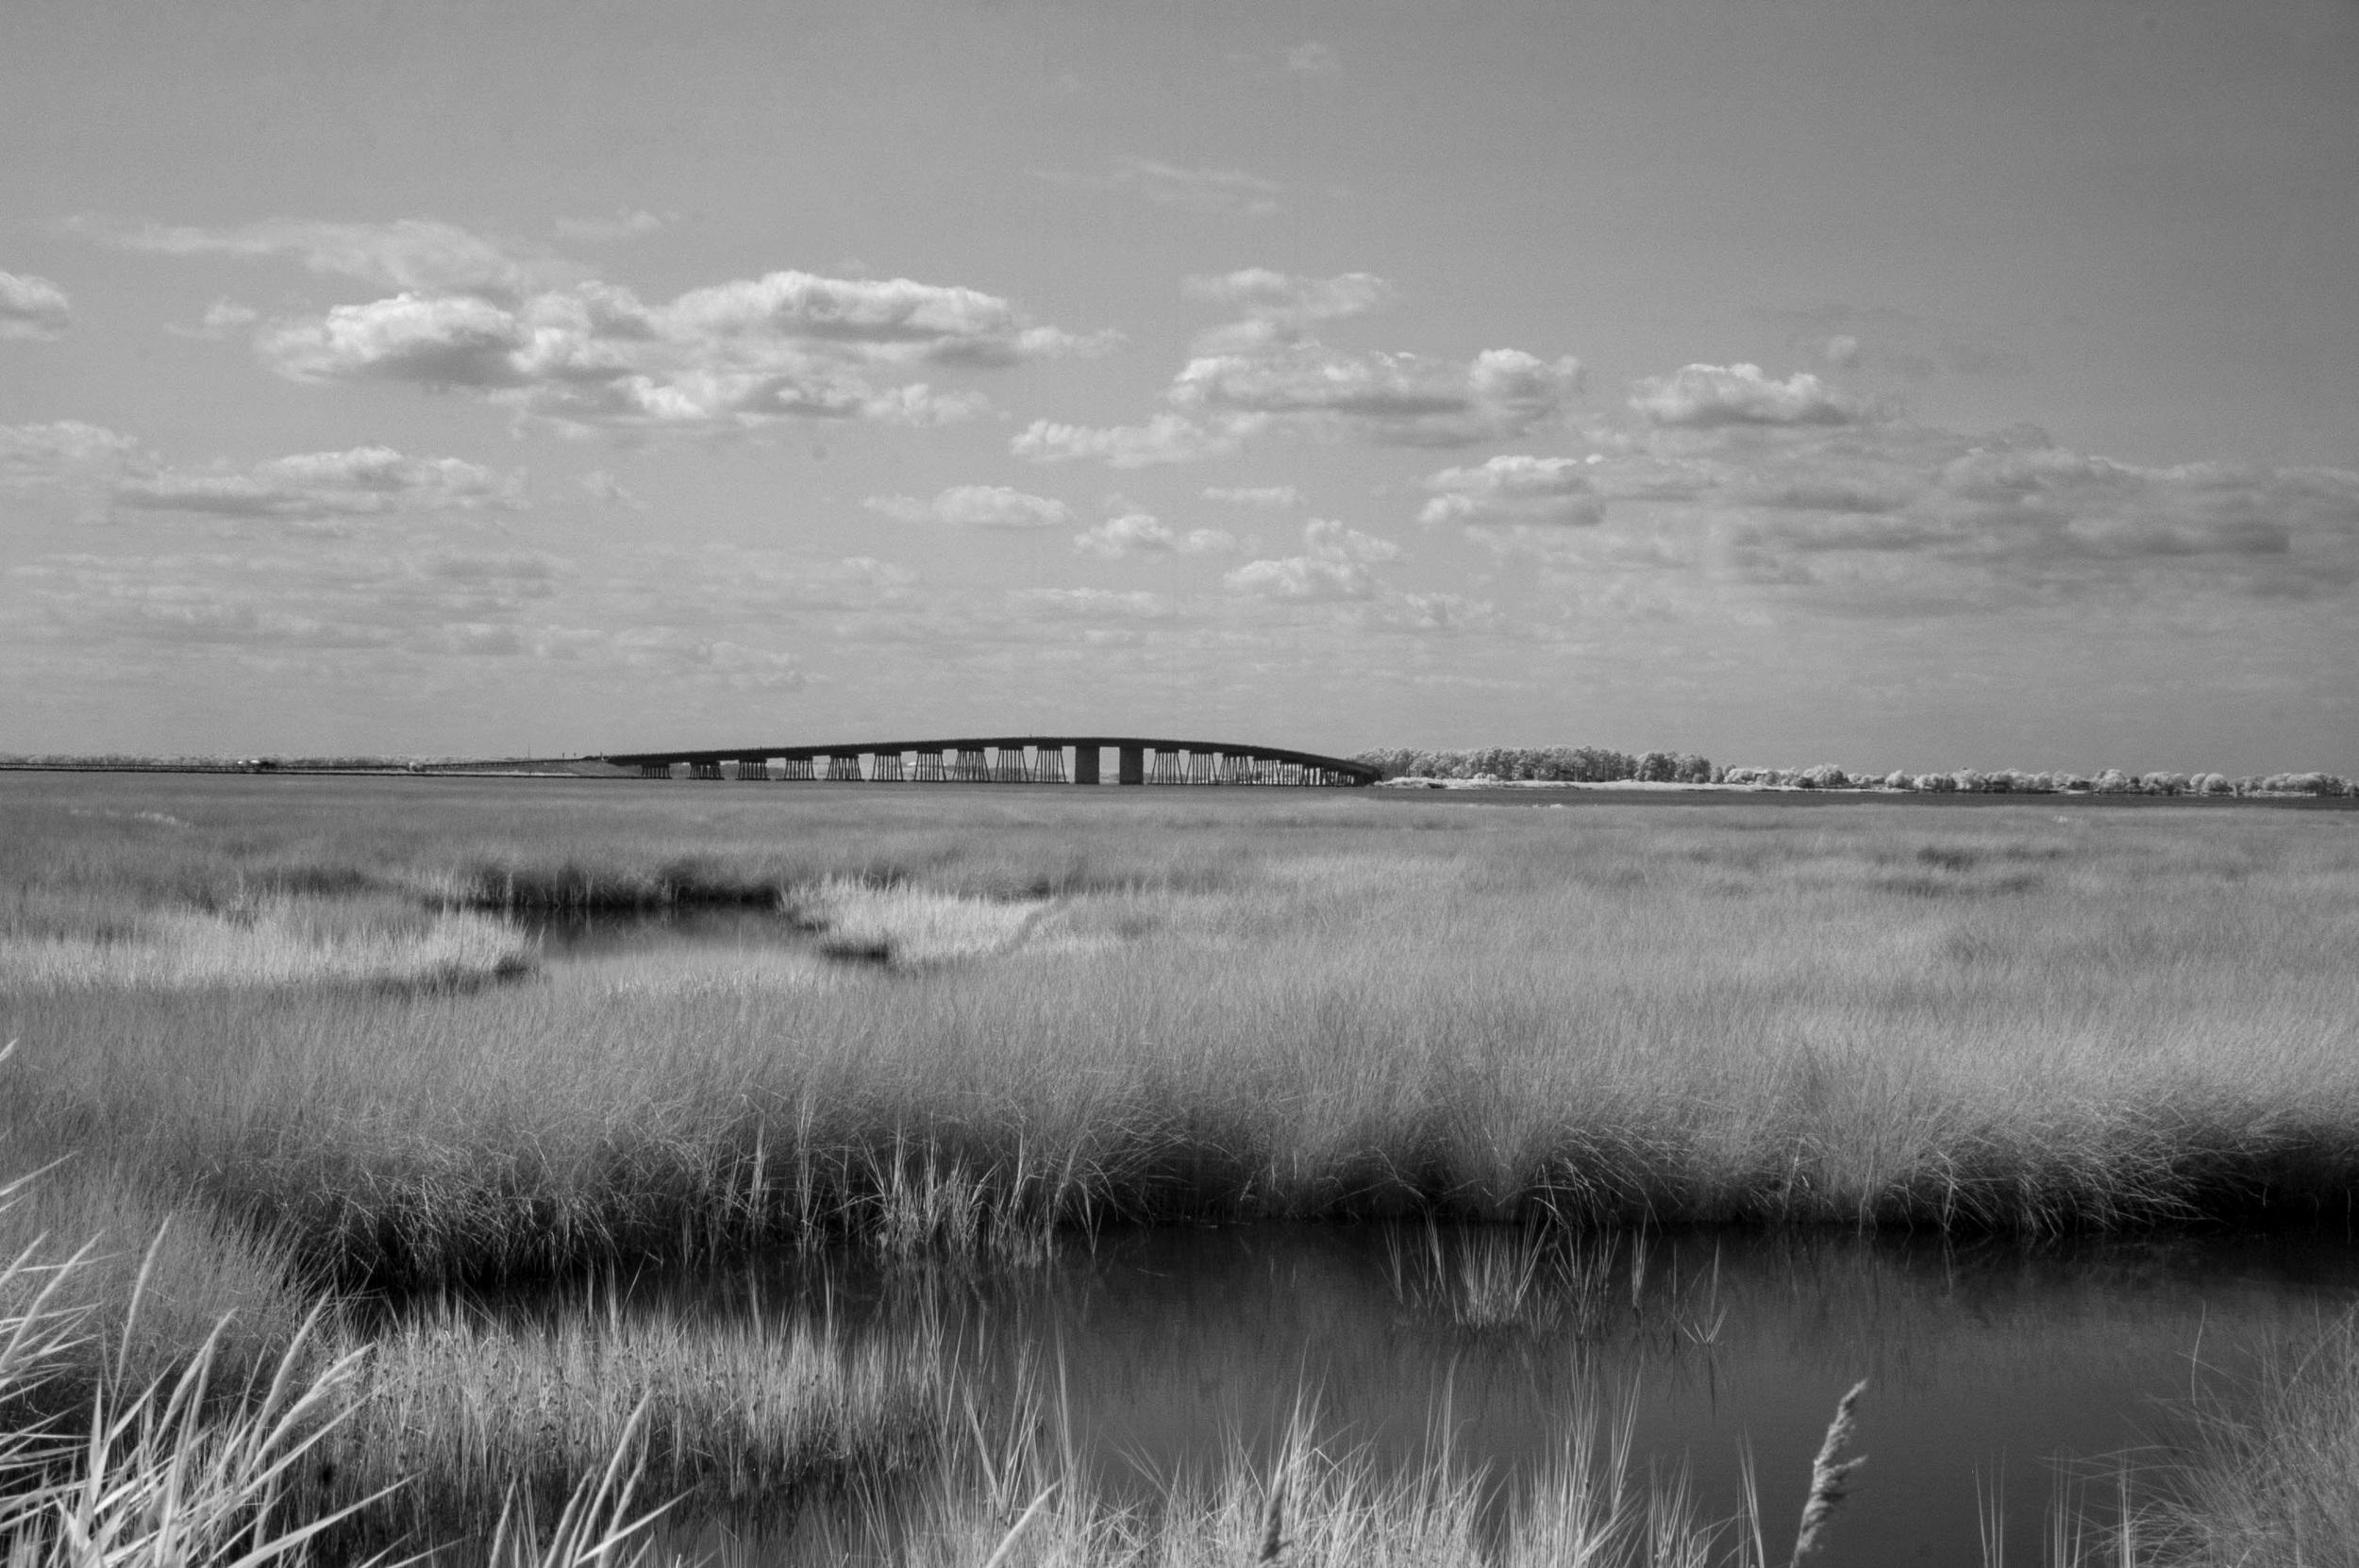 Infrared of Hooper's Island bridge